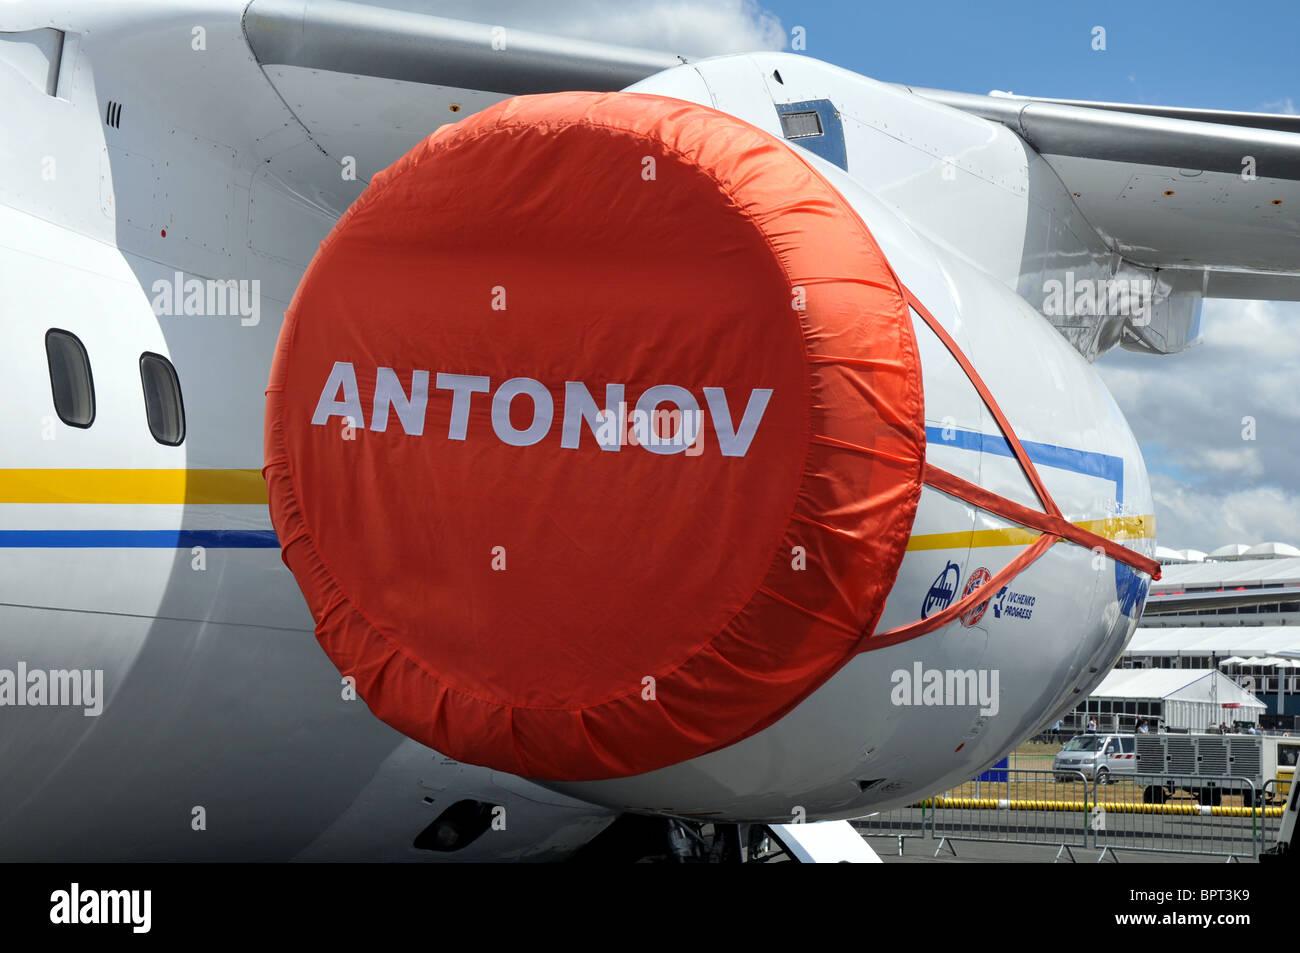 Antonov - Stock Image